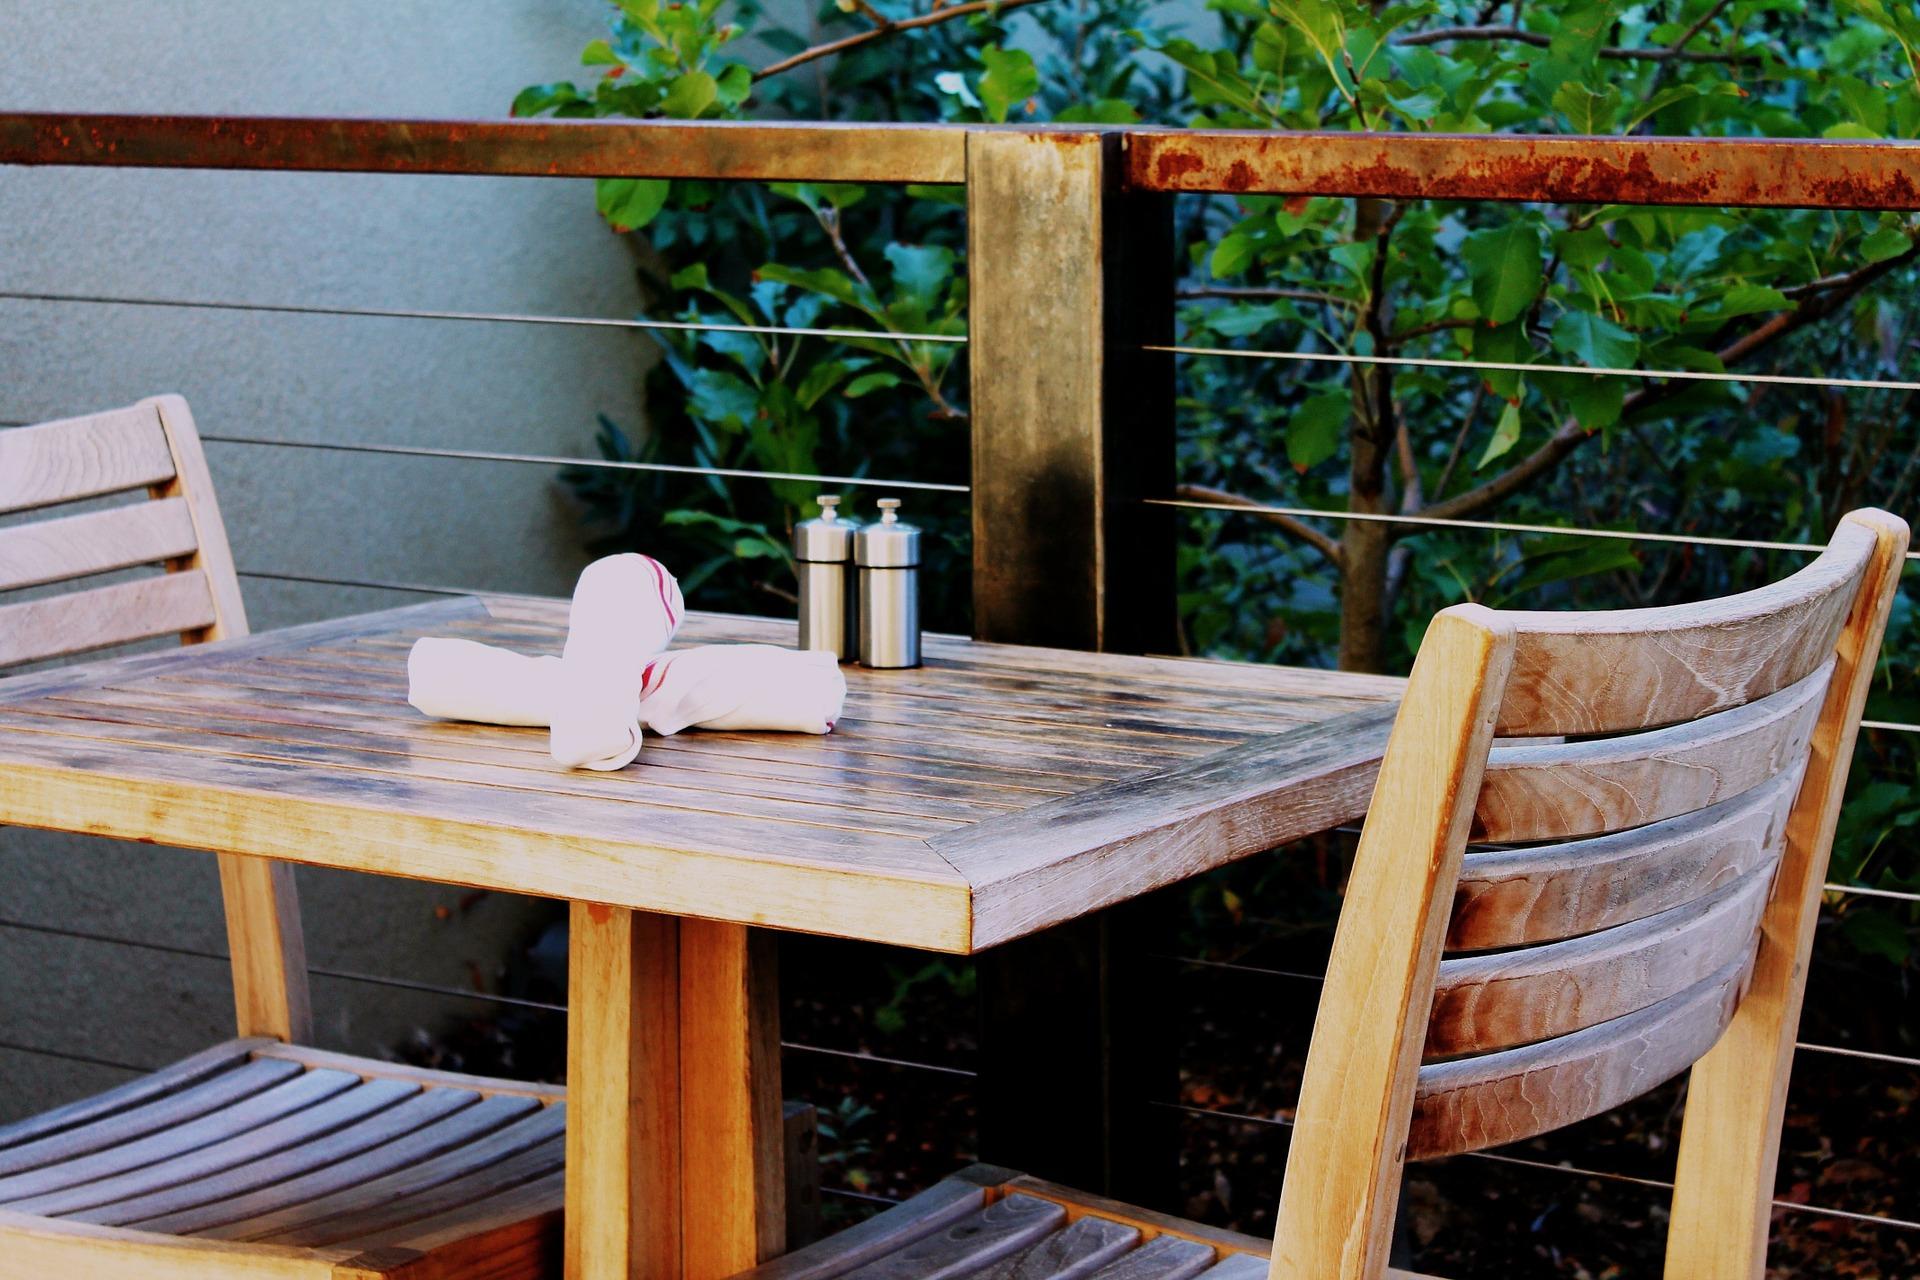 patio-table-1397535_1920